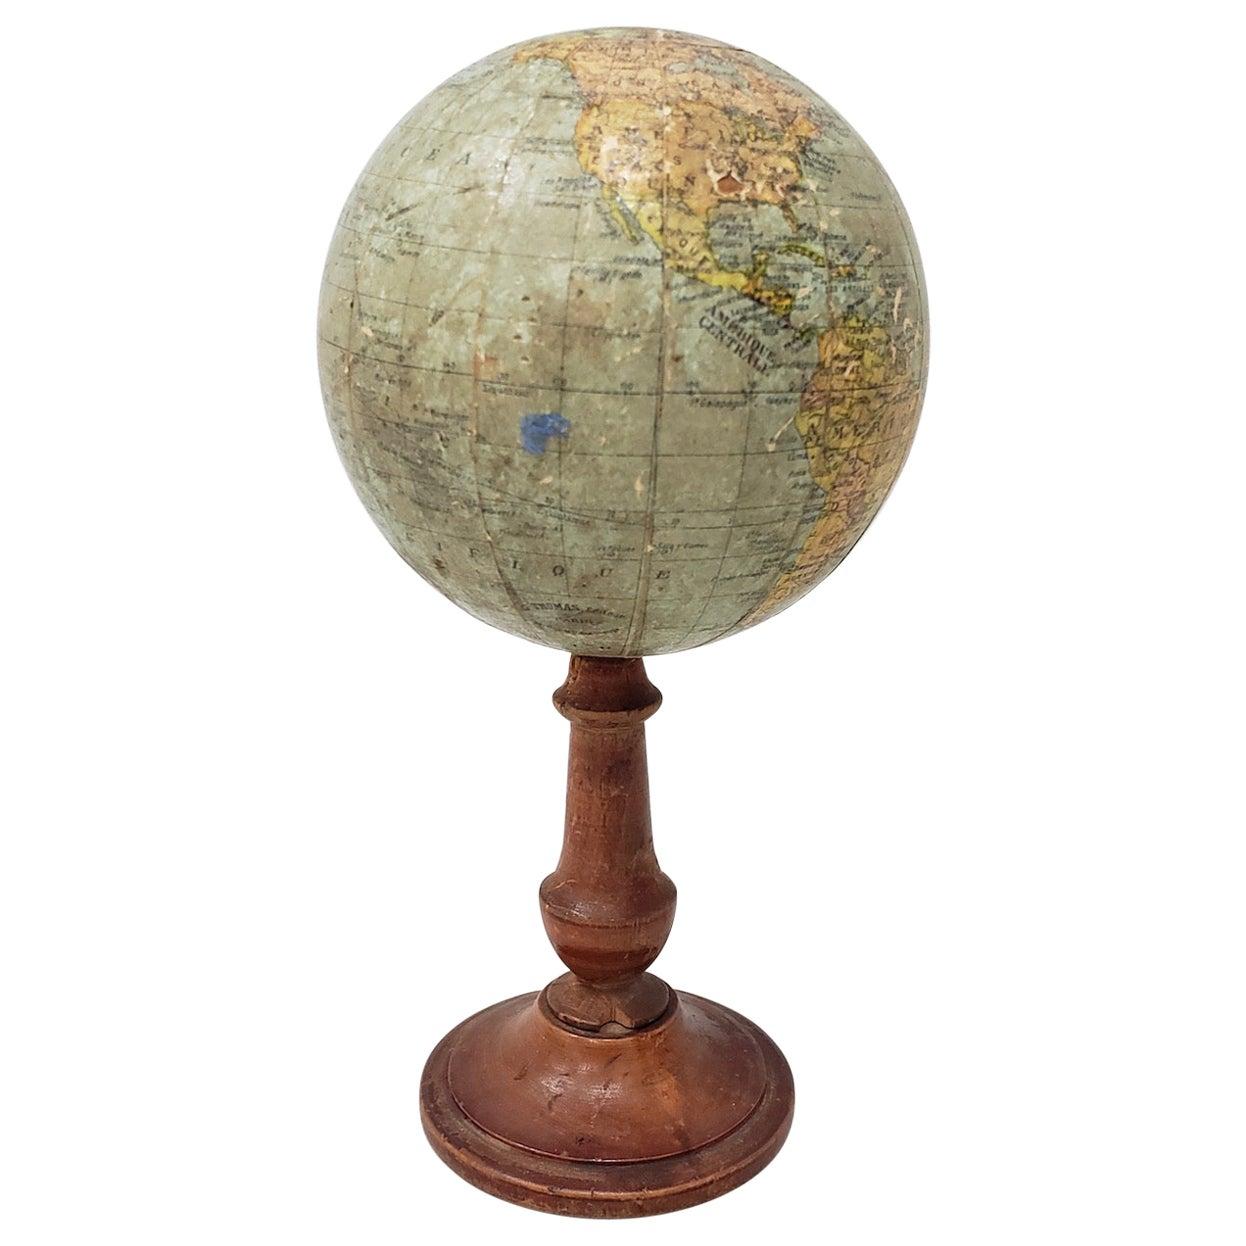 19th Century Terrestrial Globe by G. Thomas, Editeur & Globe Maker, Paris, 1890s